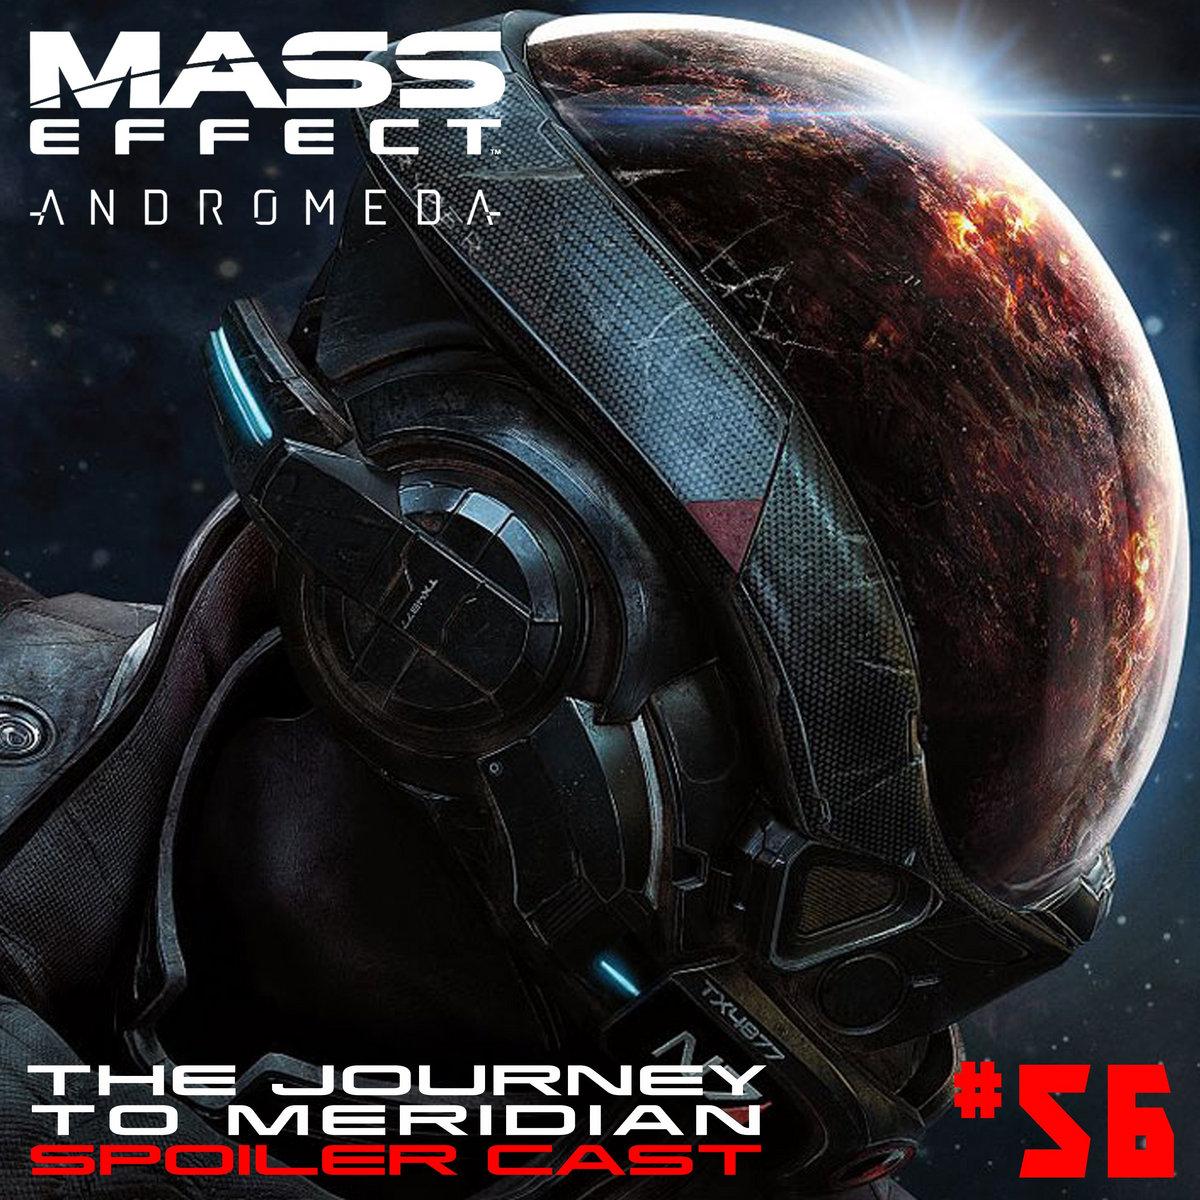 aksar 2 torrent download 720p